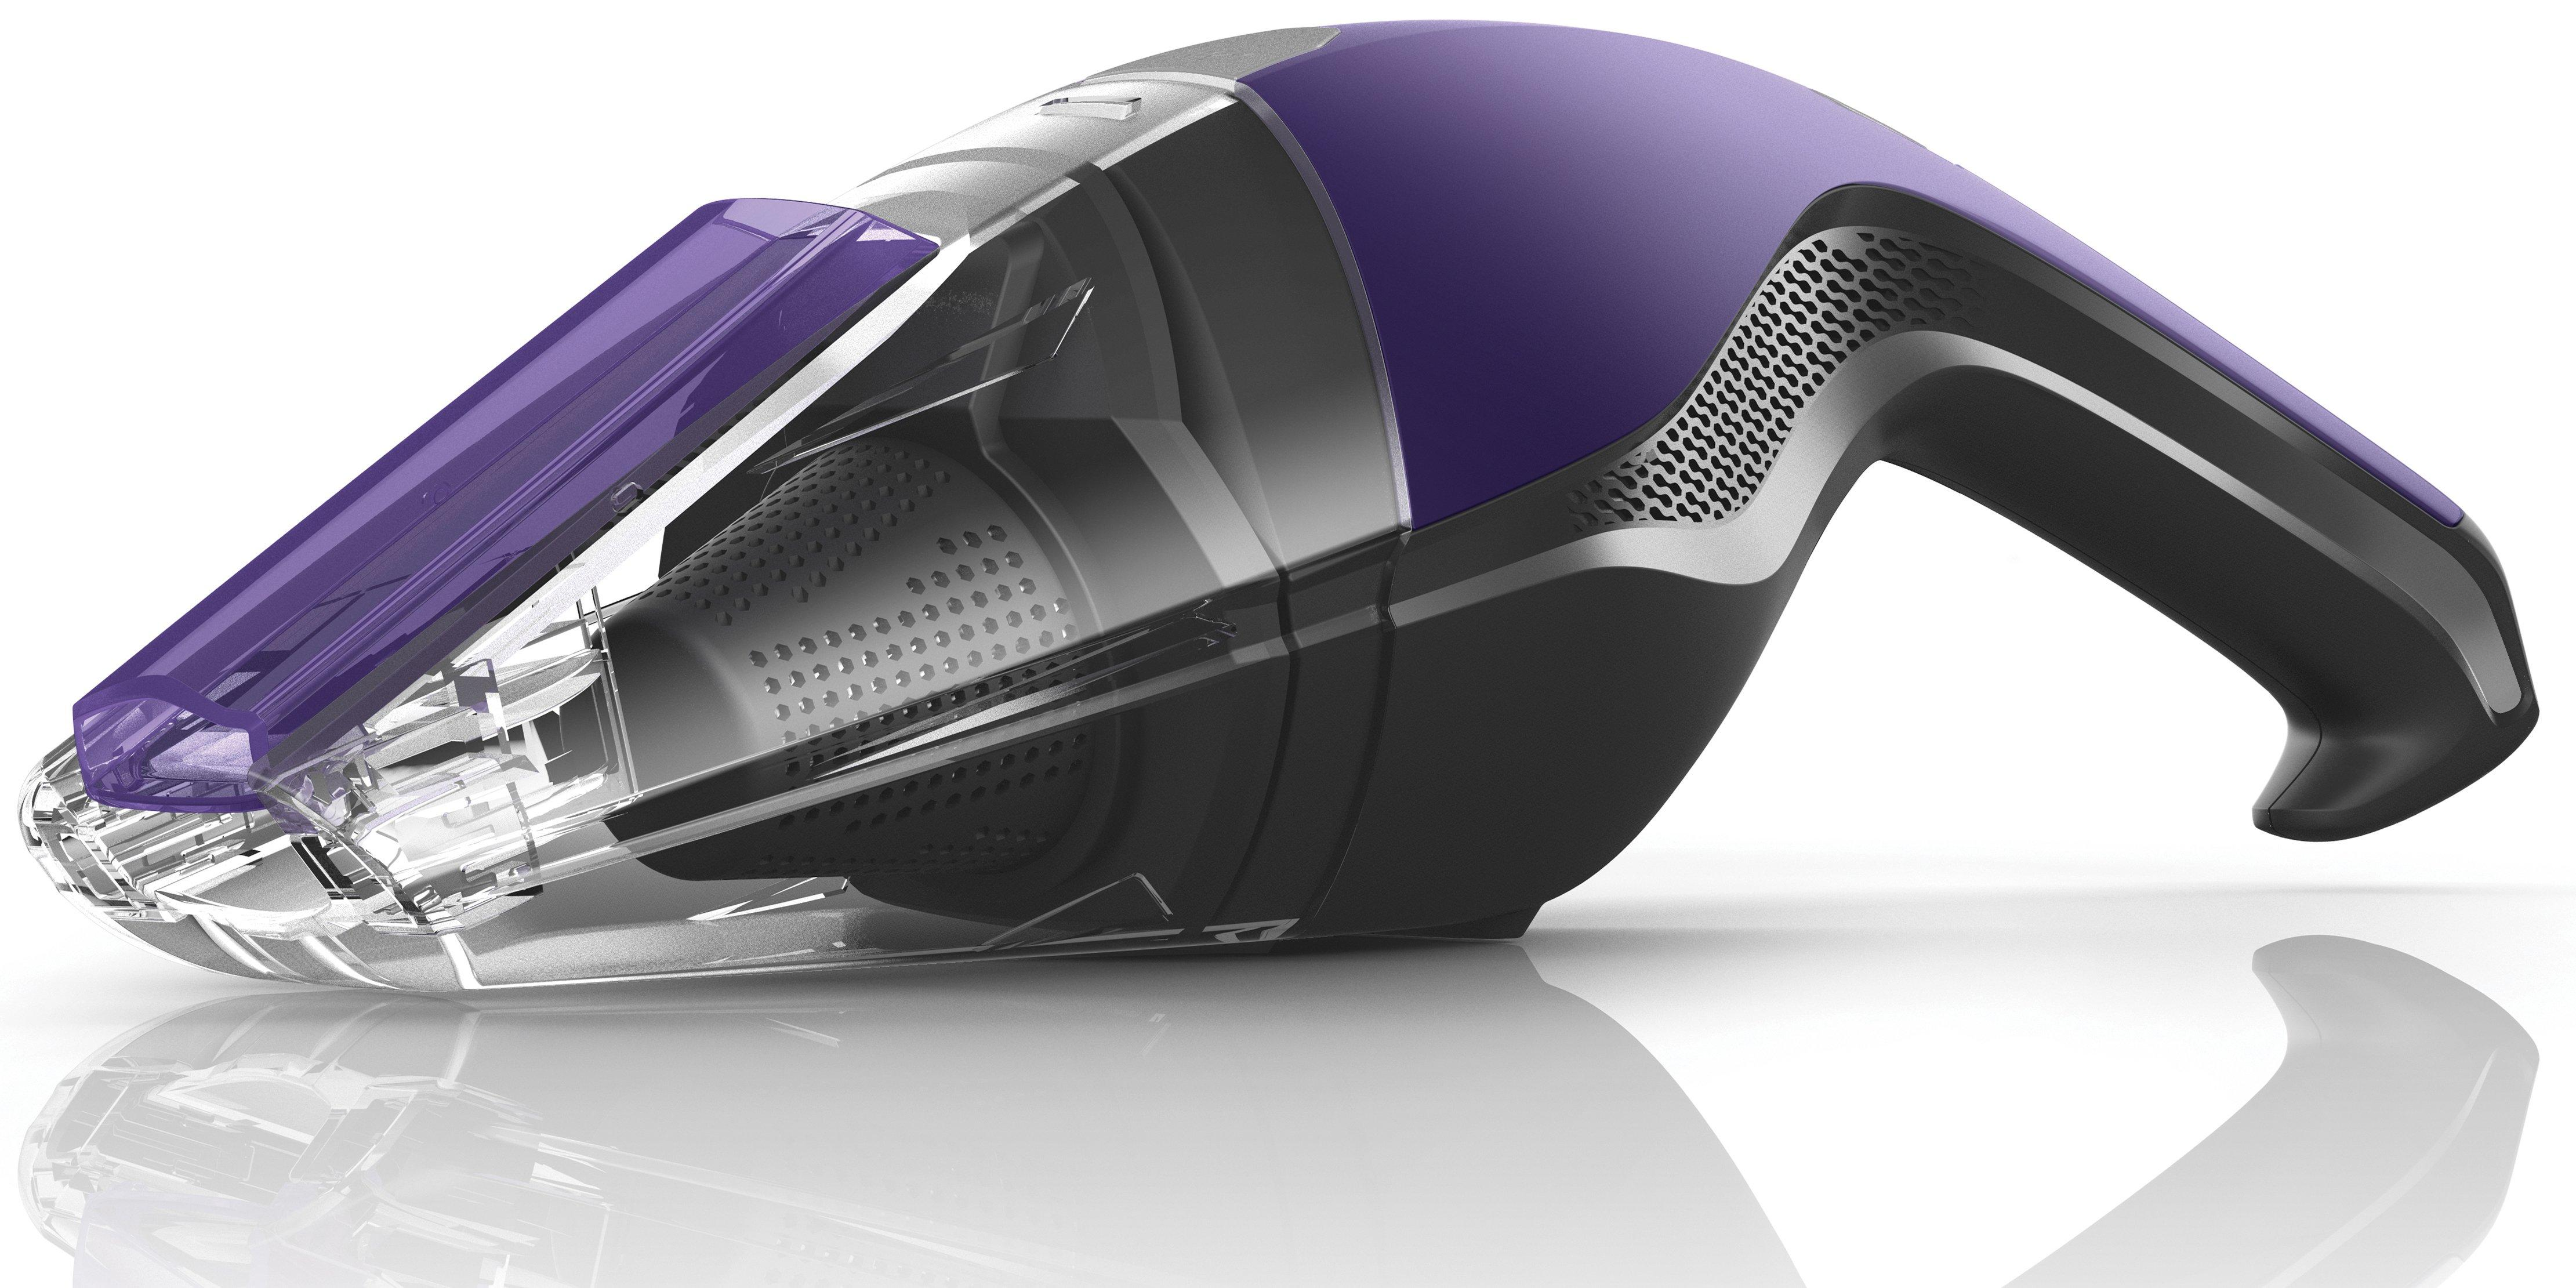 Quick Flip 8V Cordless Hand Vacuum1